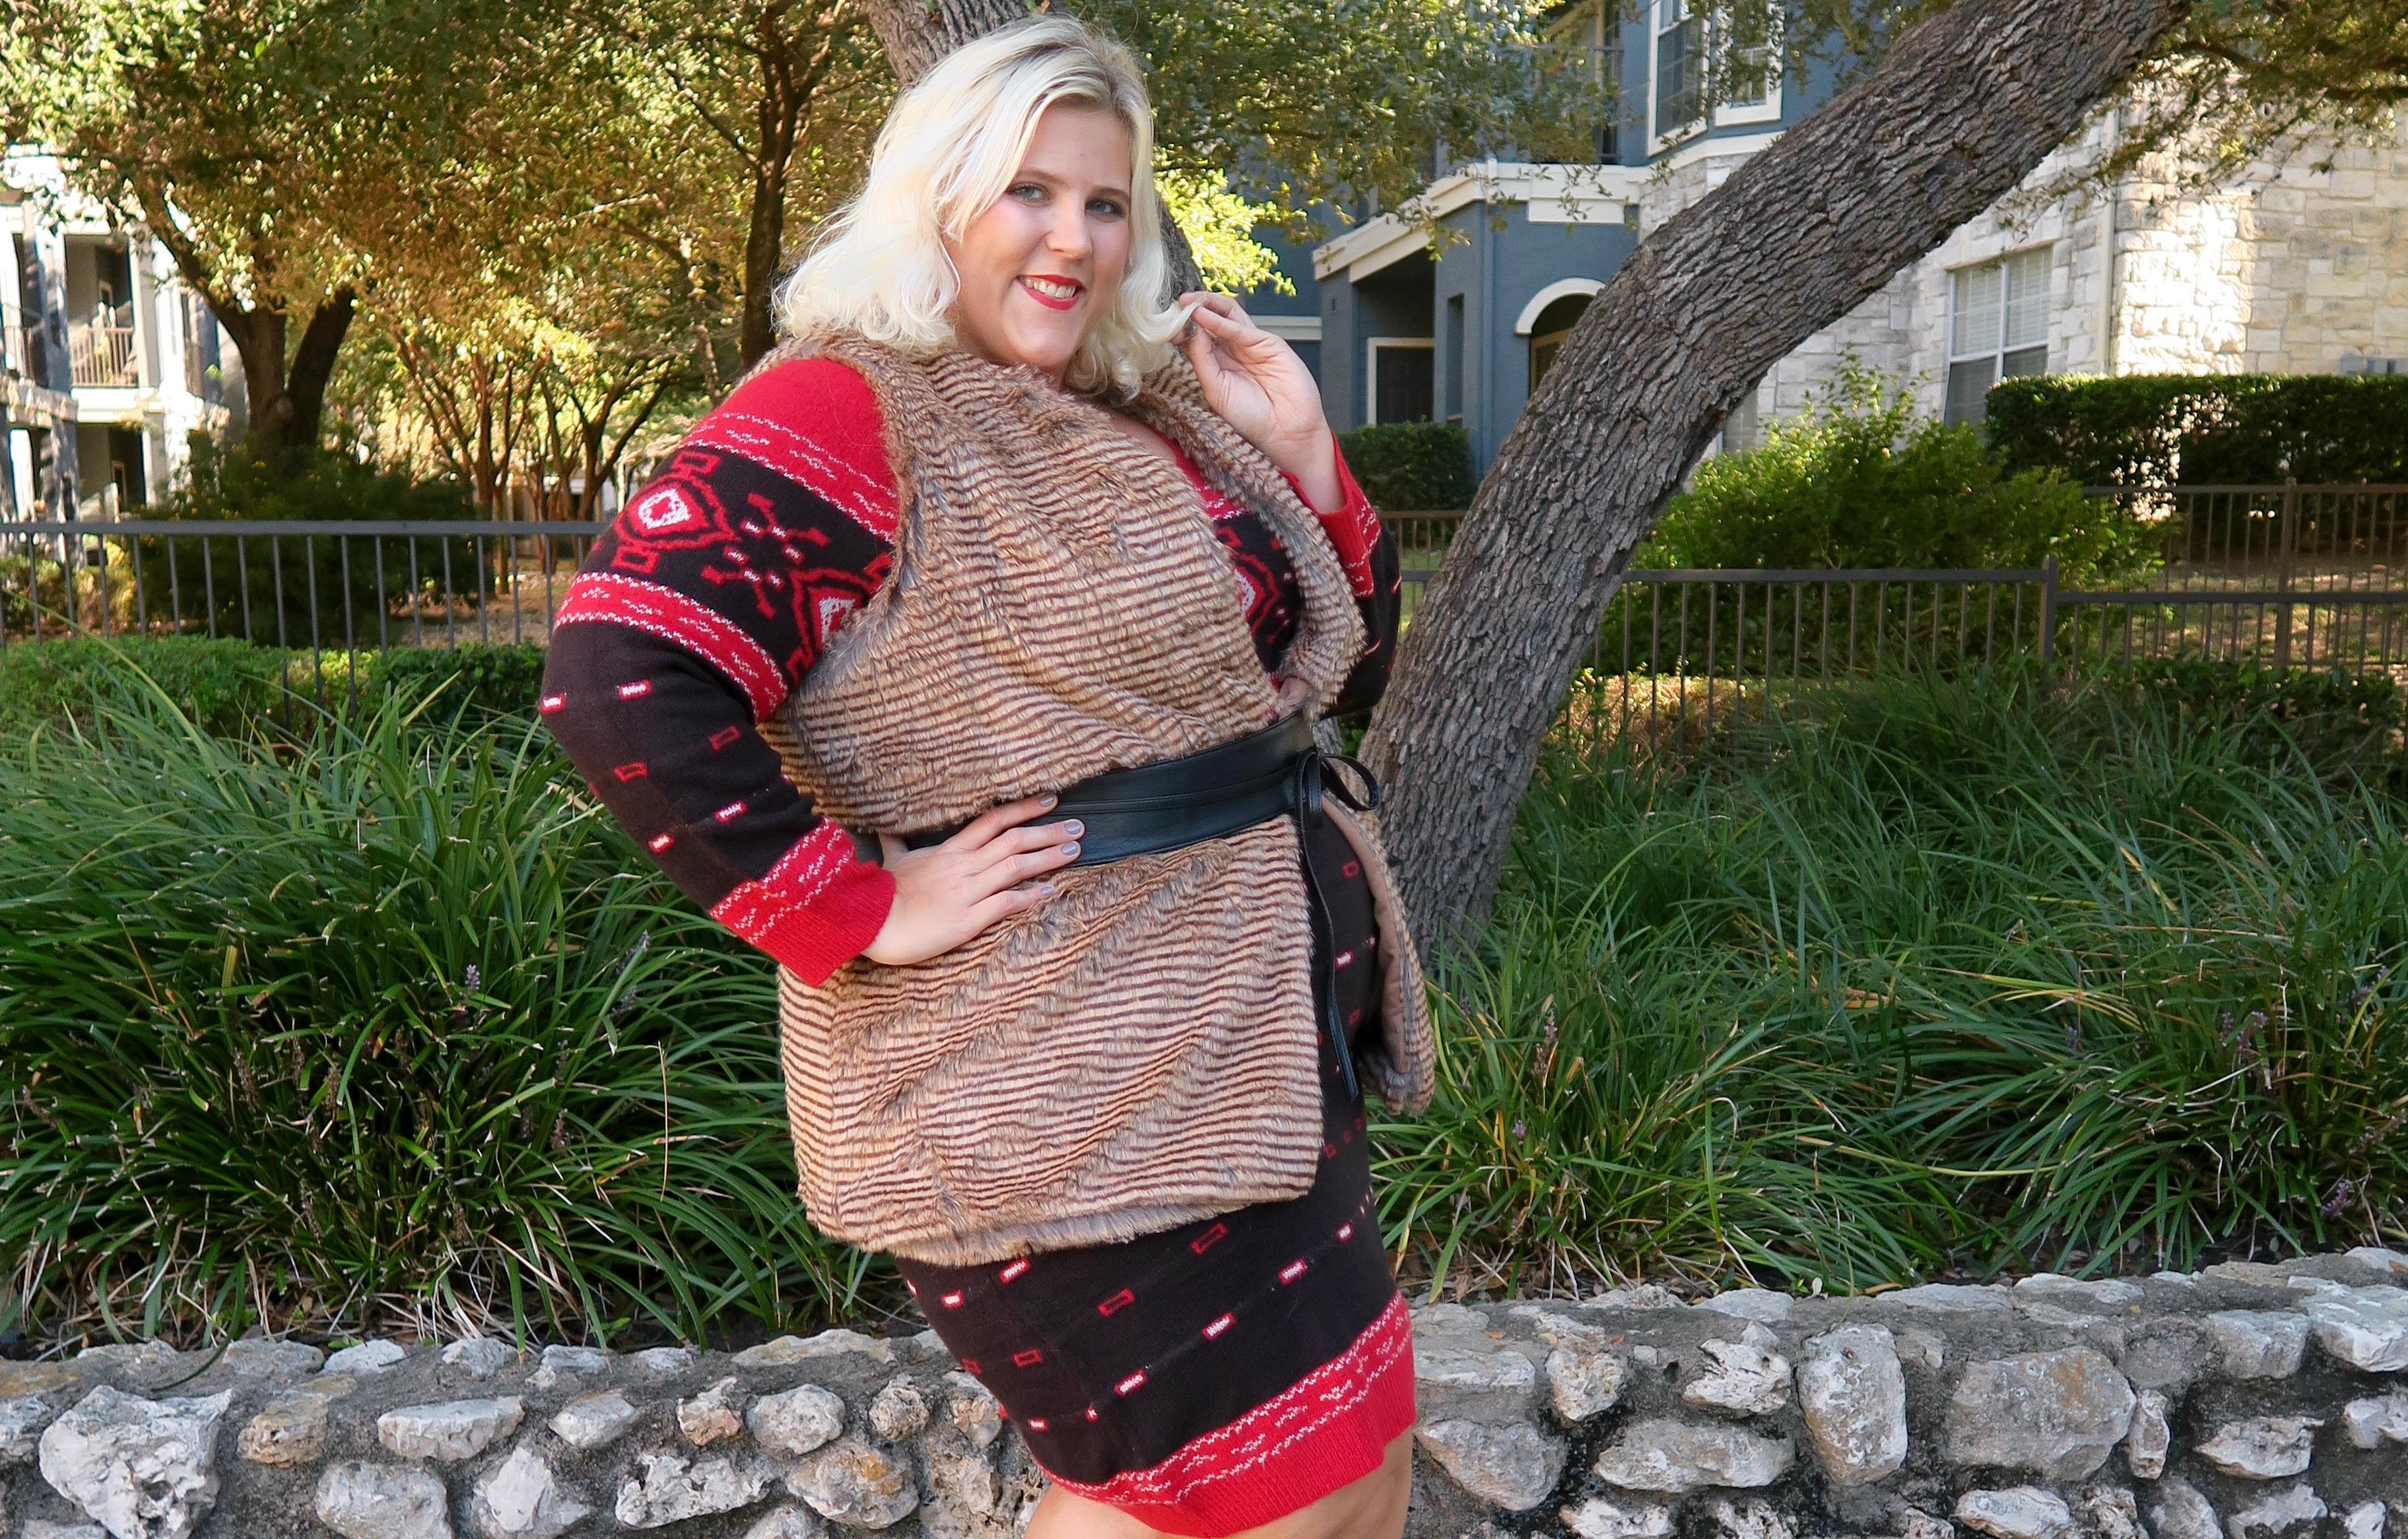 Fur + Fair Isle: A Favorite Sweater Dress Pairing